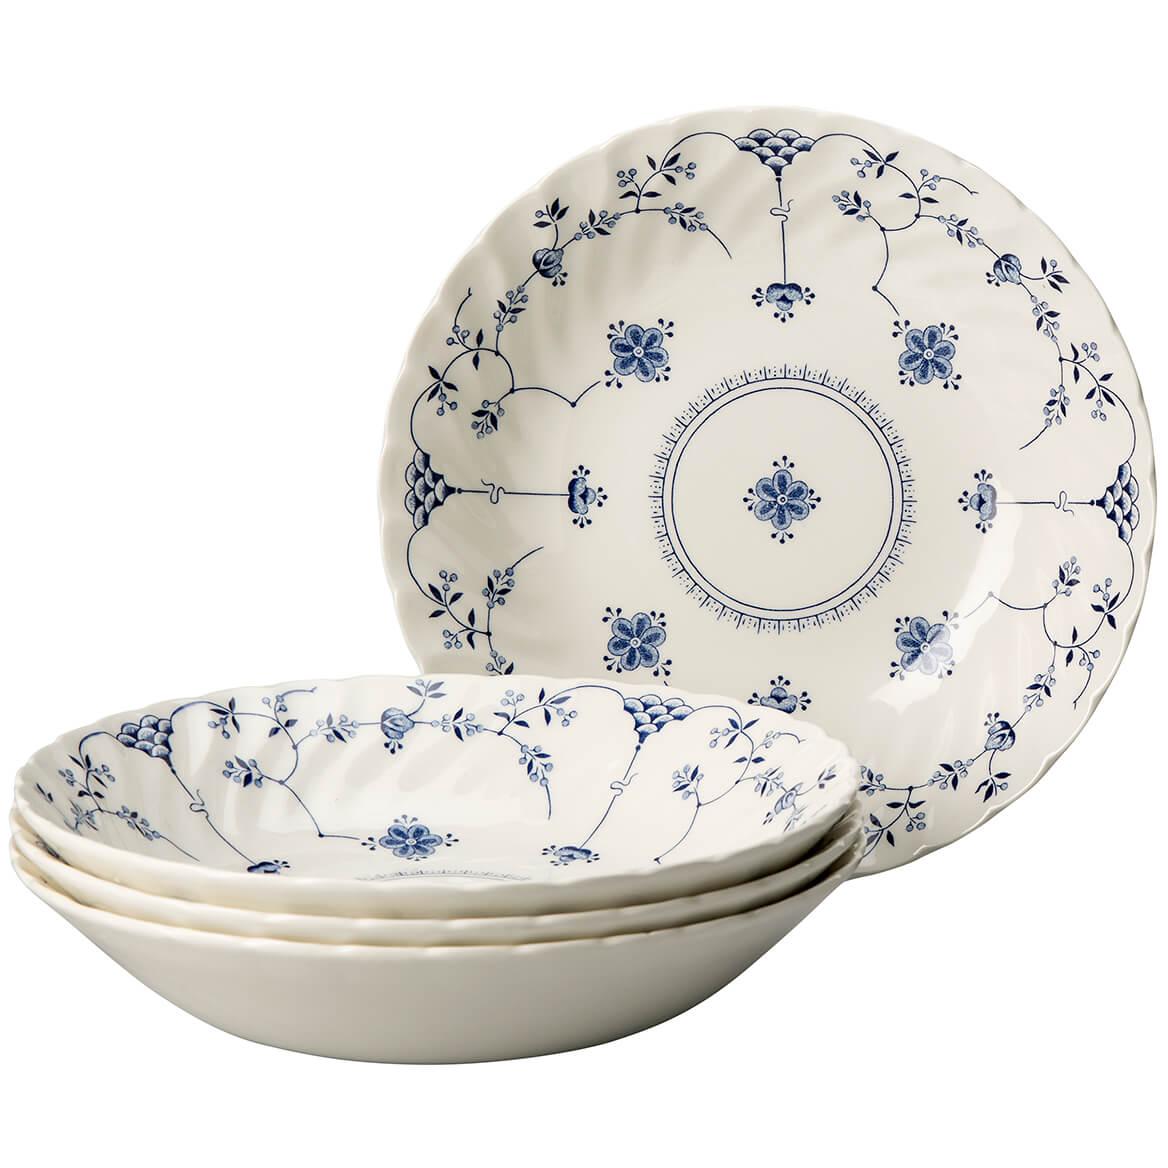 Finlandia Set of 4 All Purpose Bowls-368563